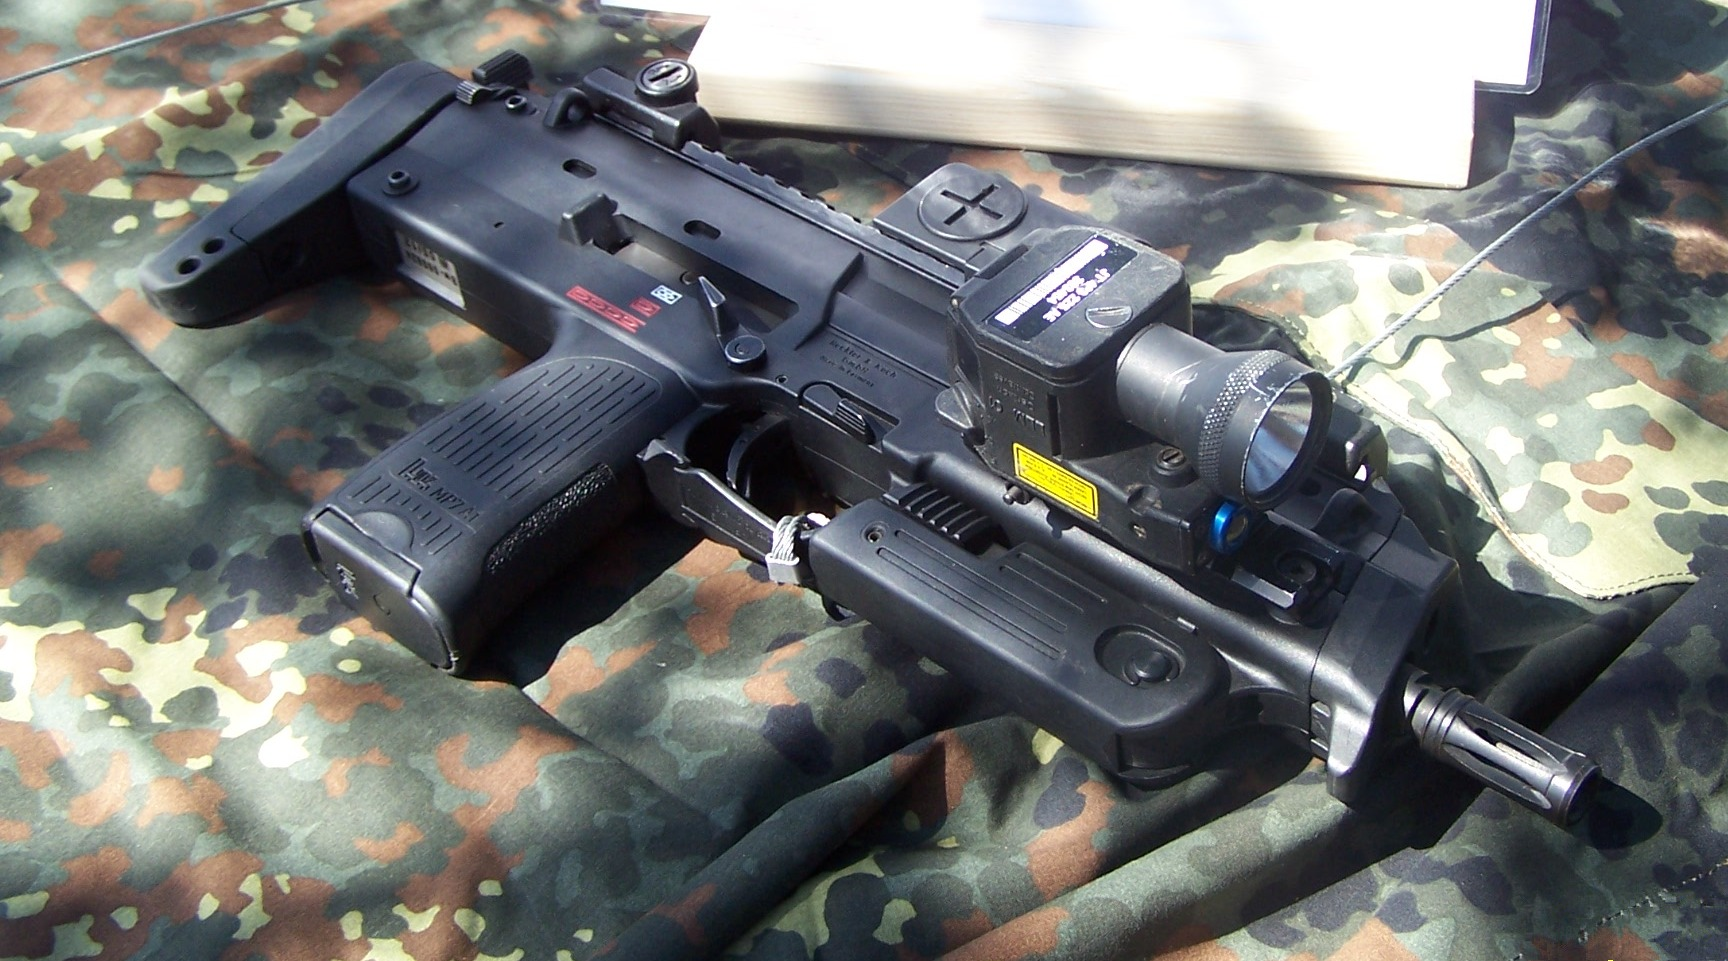 K 11 Gun File:HK MP7 2.jpg - Wi...